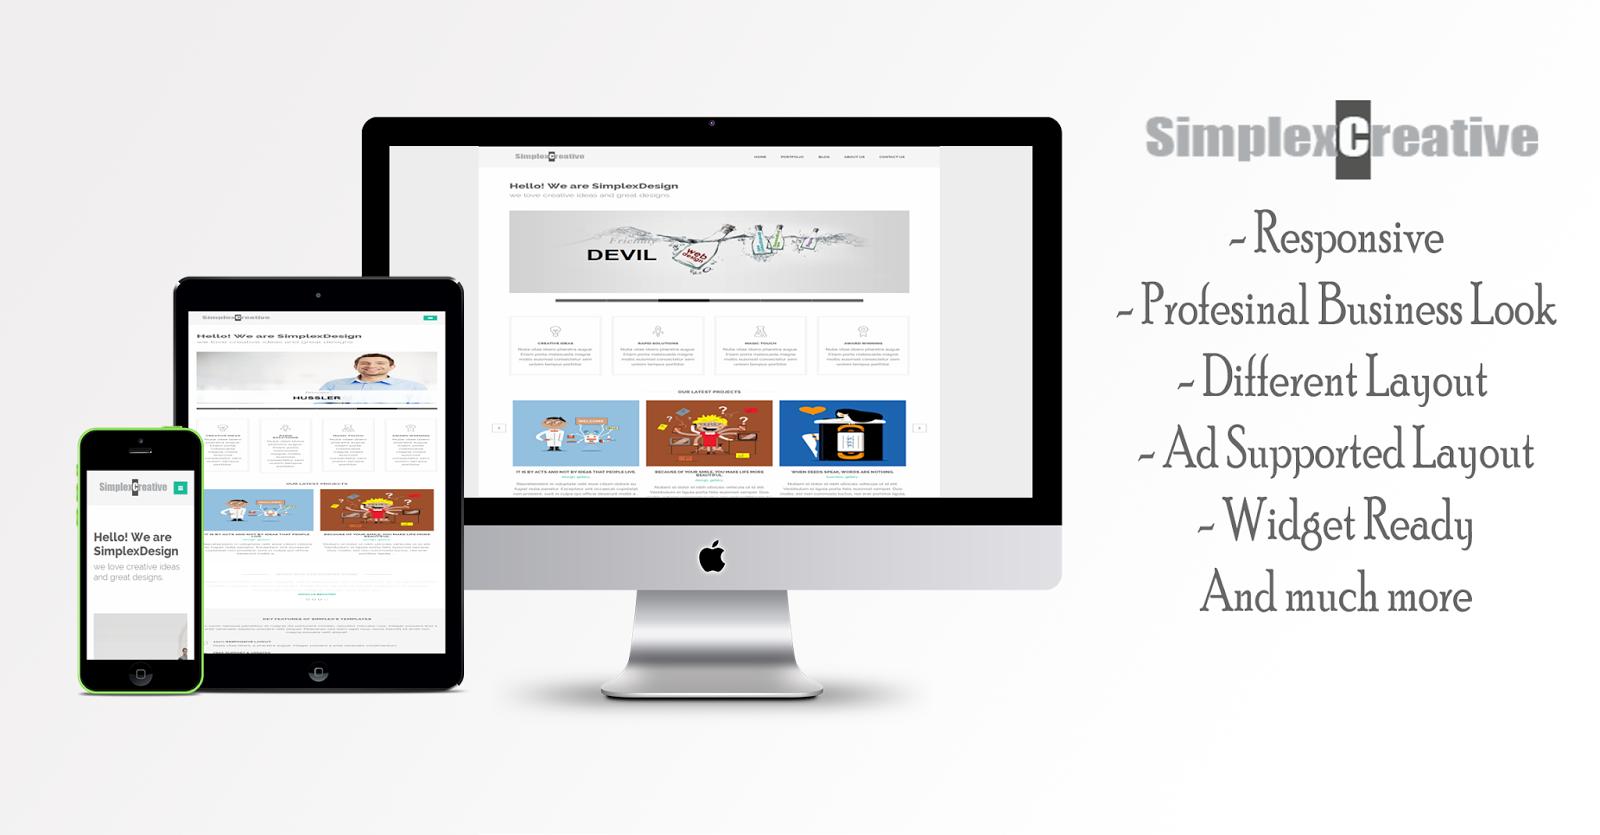 Chia sẻ template blogspot làm website công ty